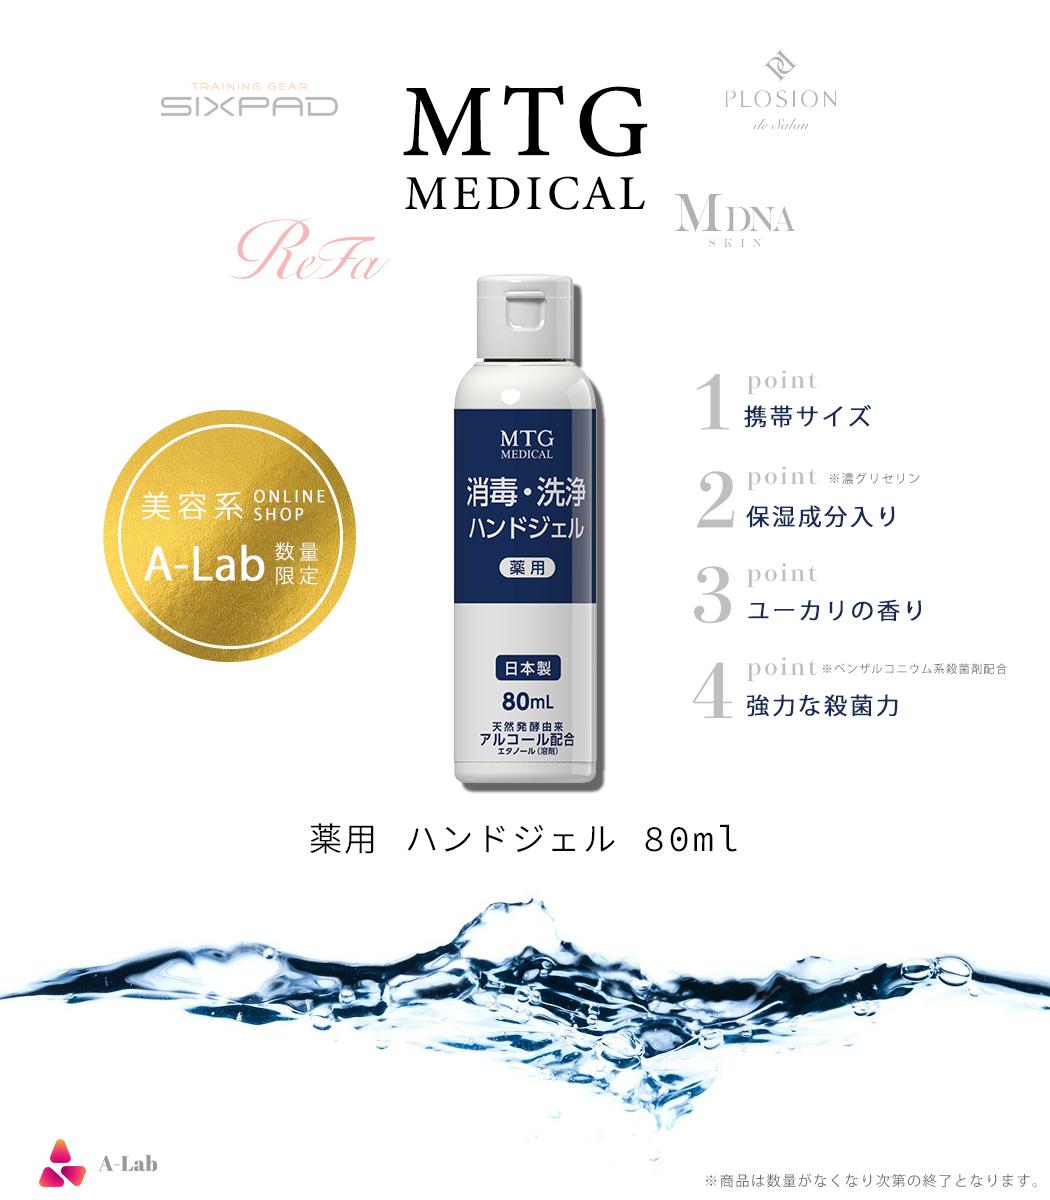 MTG ハンドジェル 80ml